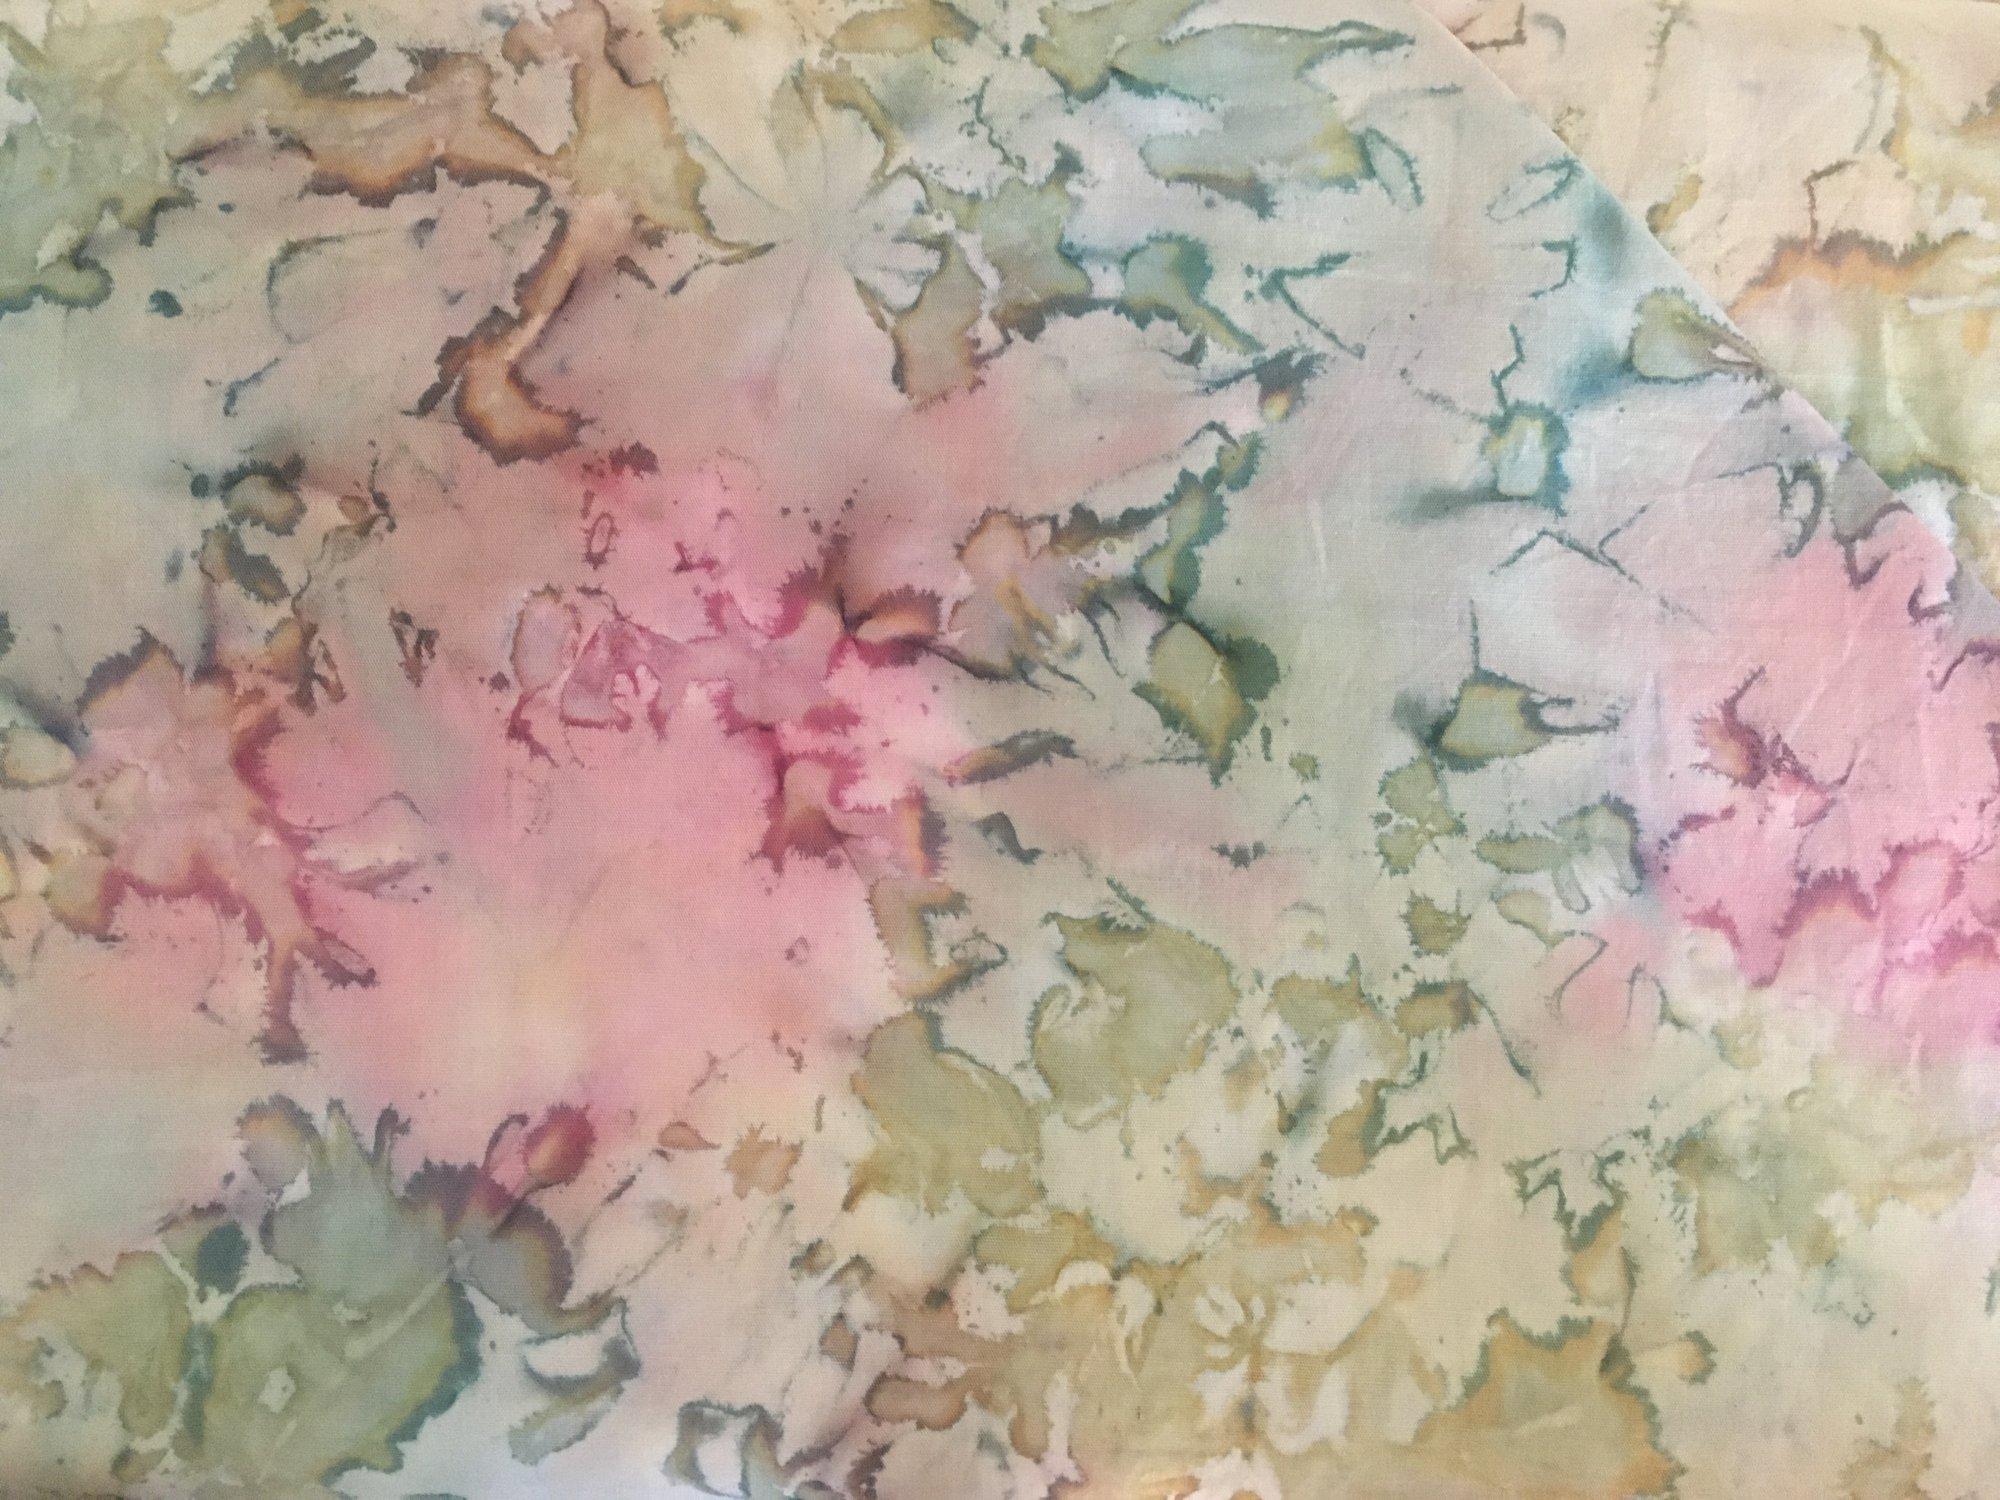 BATIK CRUSH PASTEL JEWEL 72WW006 Fabrics That Care